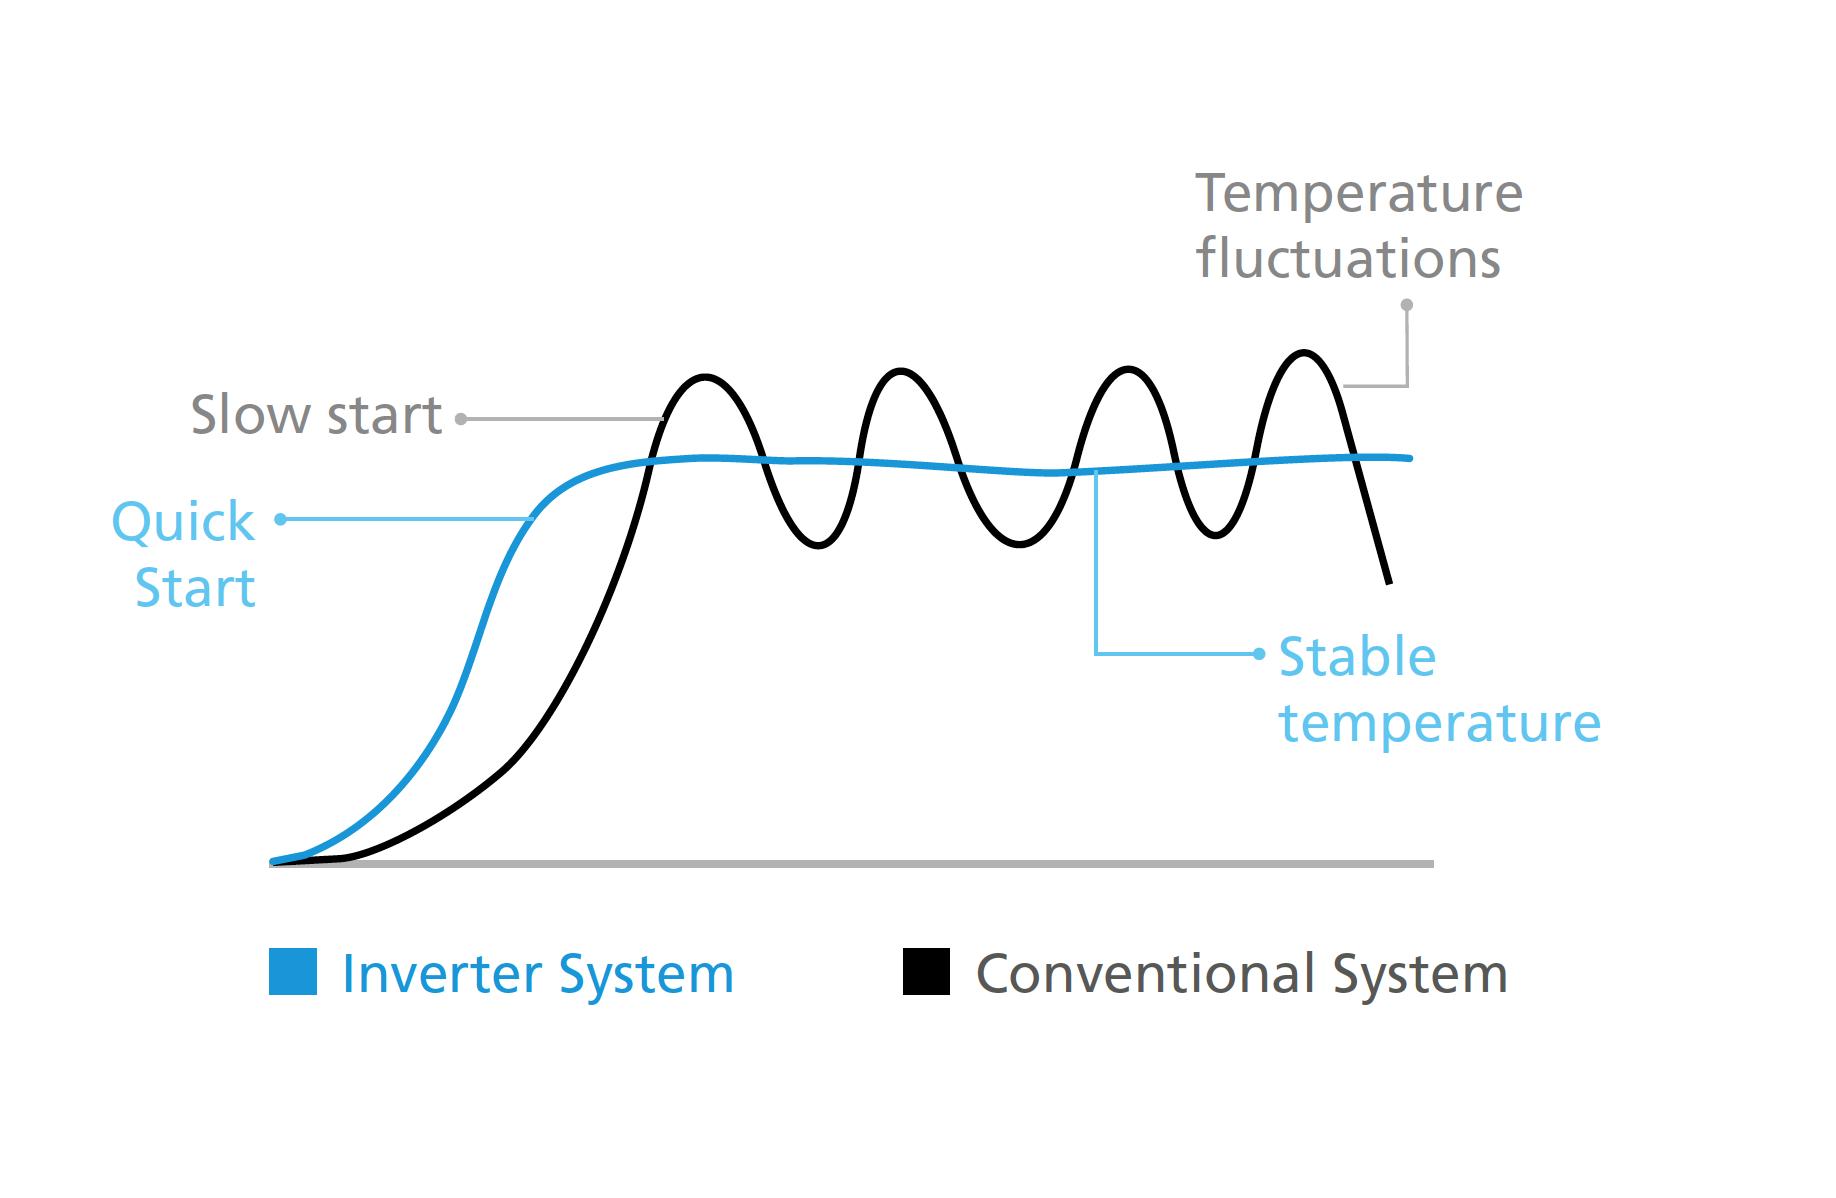 Inverter system